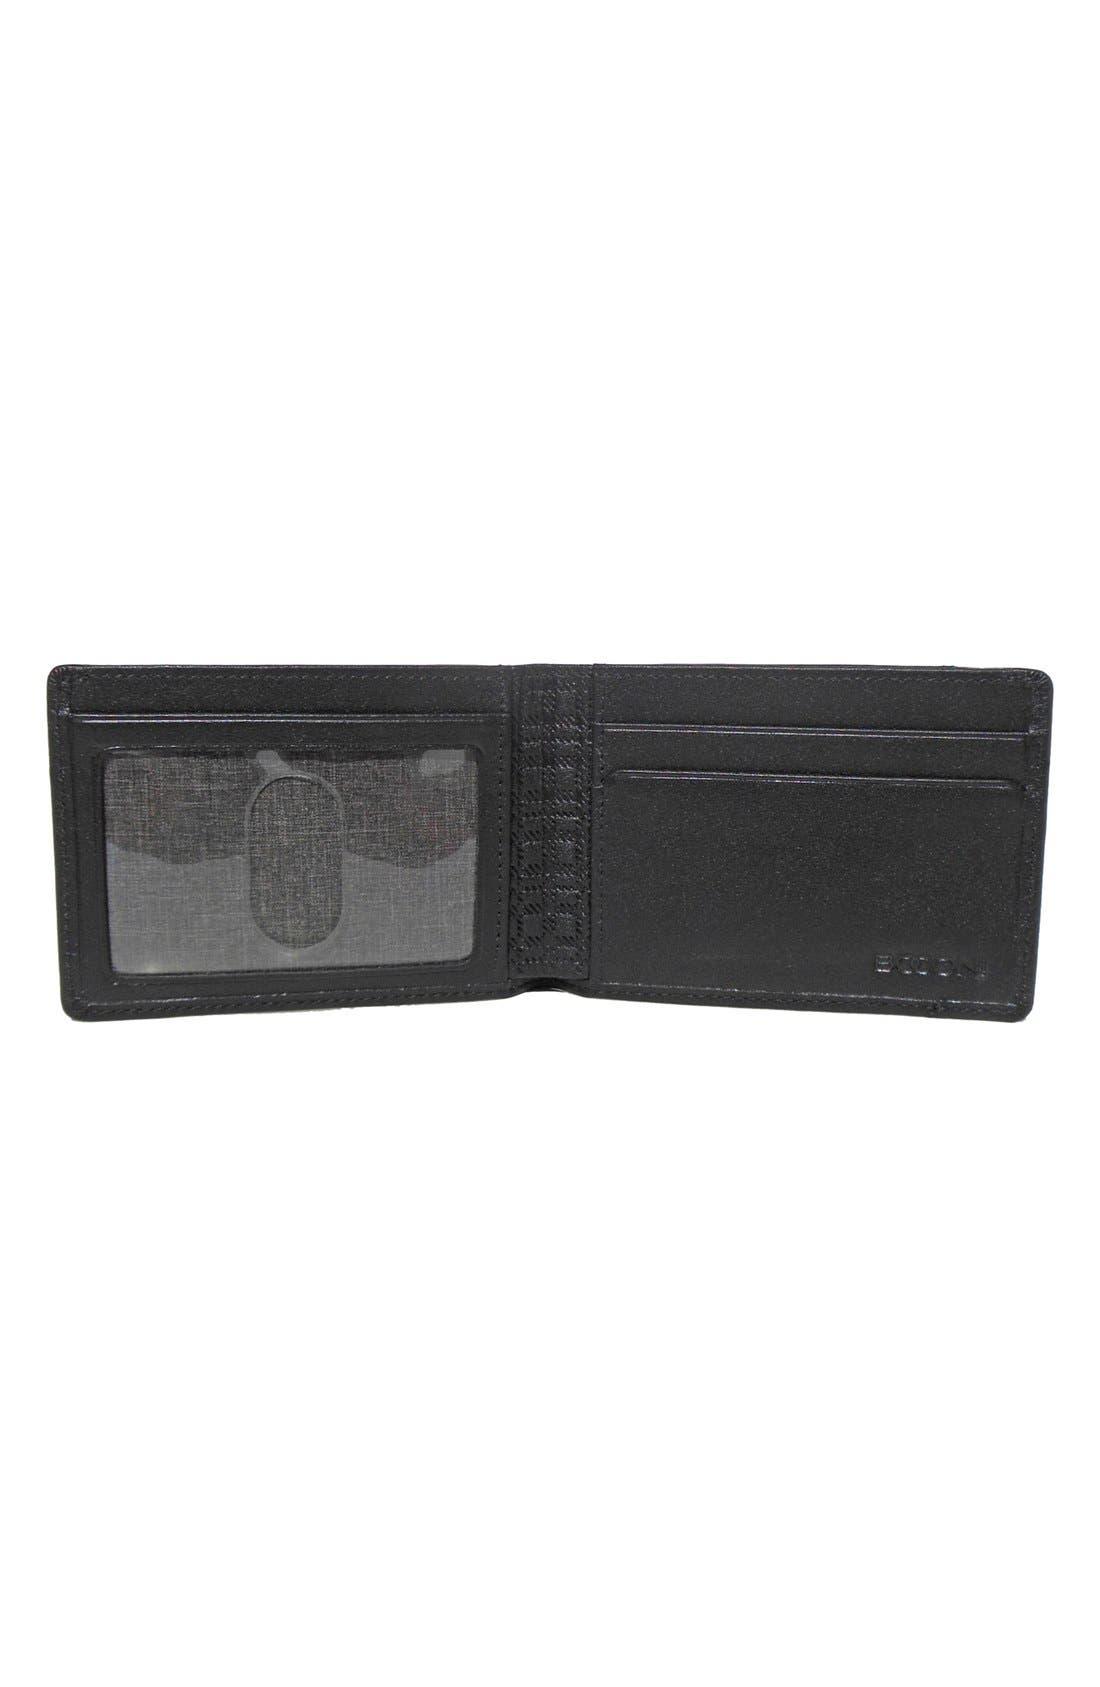 'Grant Slimster' RFID Blocker Leather Wallet,                             Alternate thumbnail 2, color,                             Black/ Grey